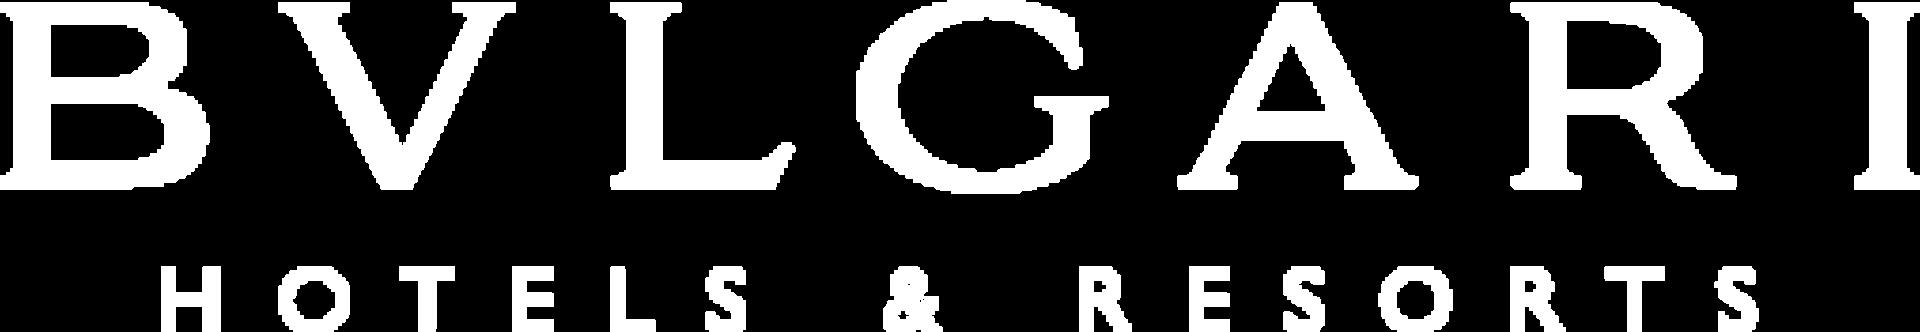 Bvlgari Hotel Logo